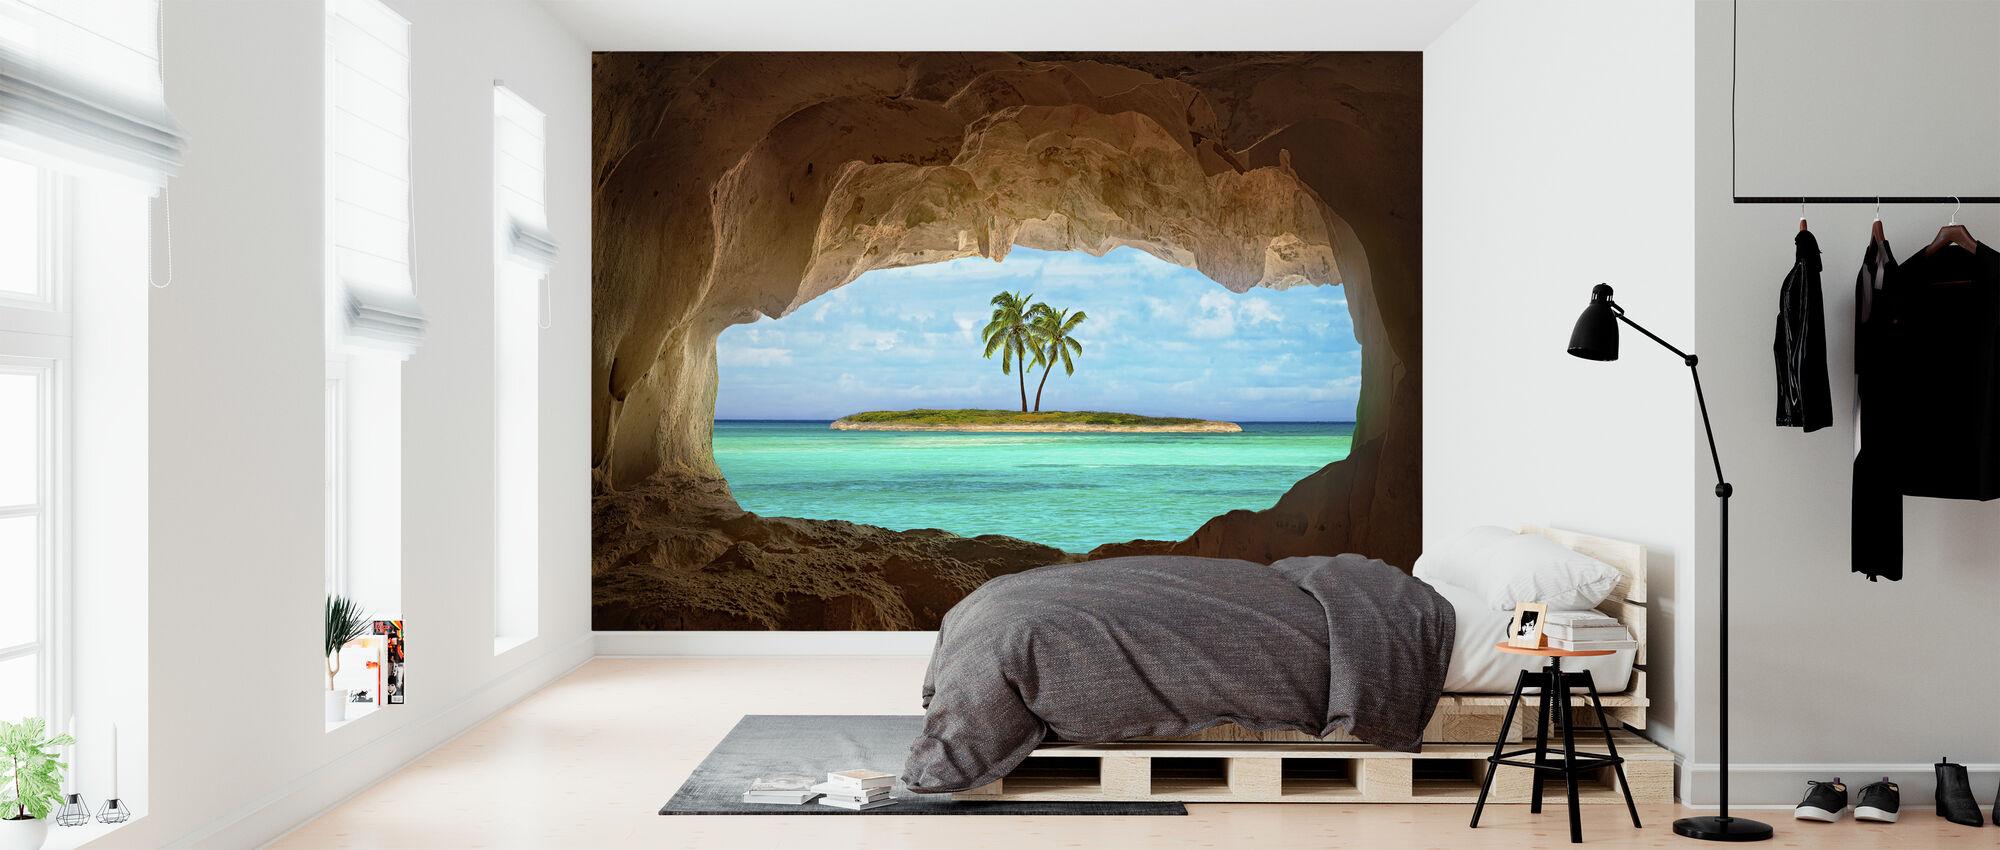 Paradise through Window - Wallpaper - Bedroom